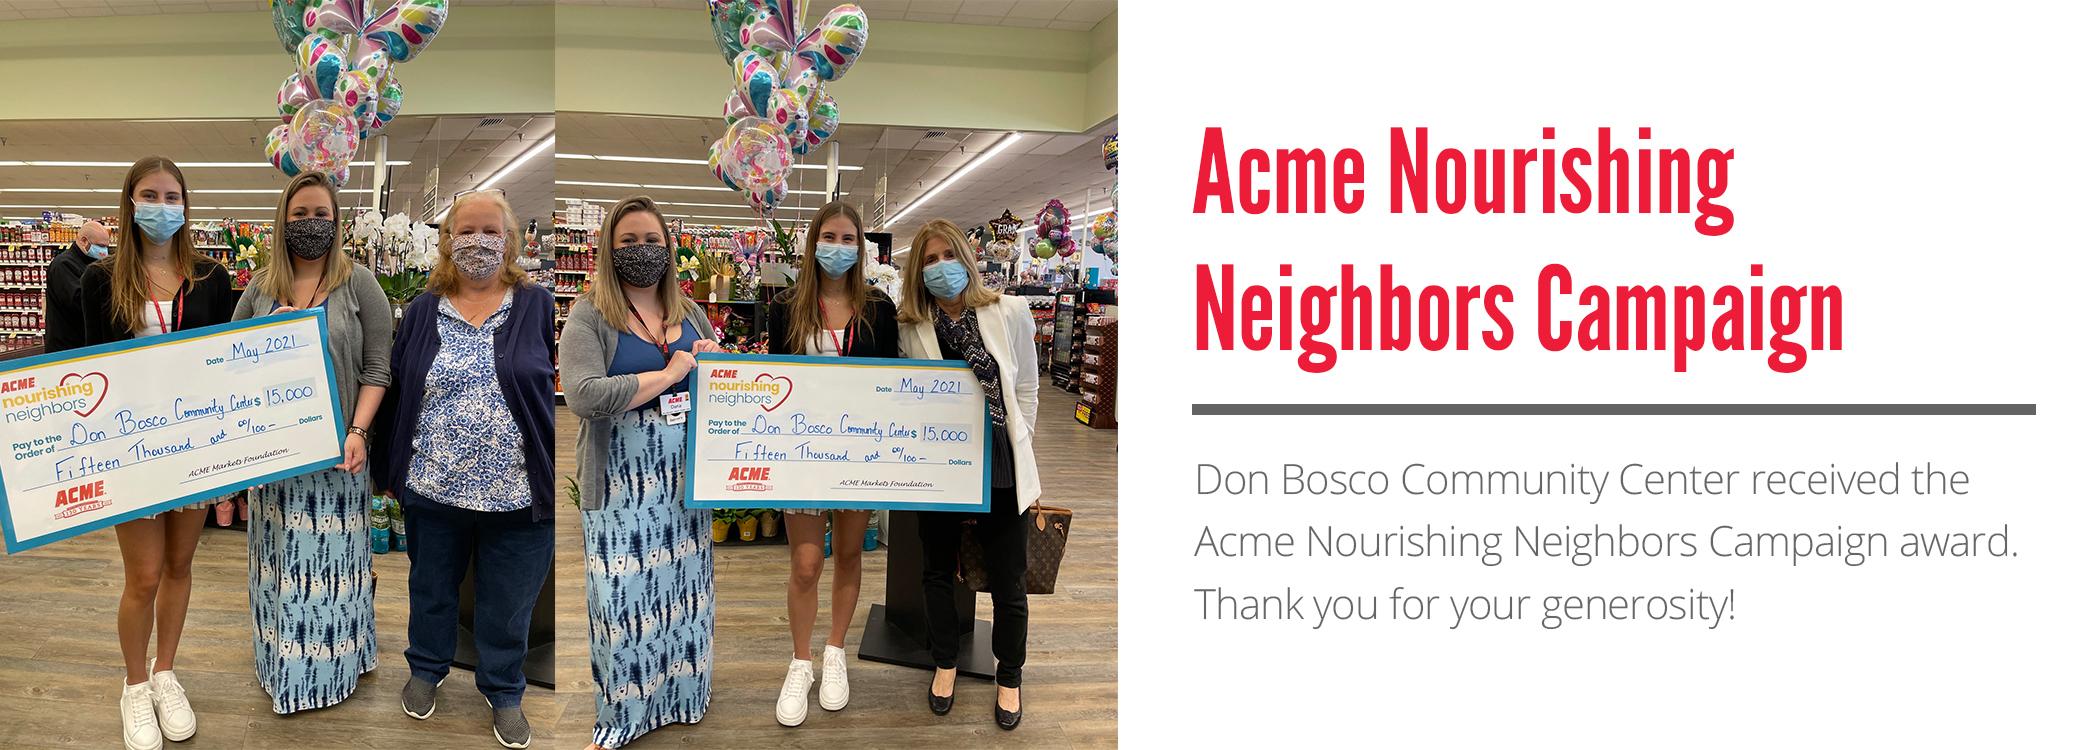 Acme Nourishing Neighbors Campaign Awarded to Don Bosco Community Center